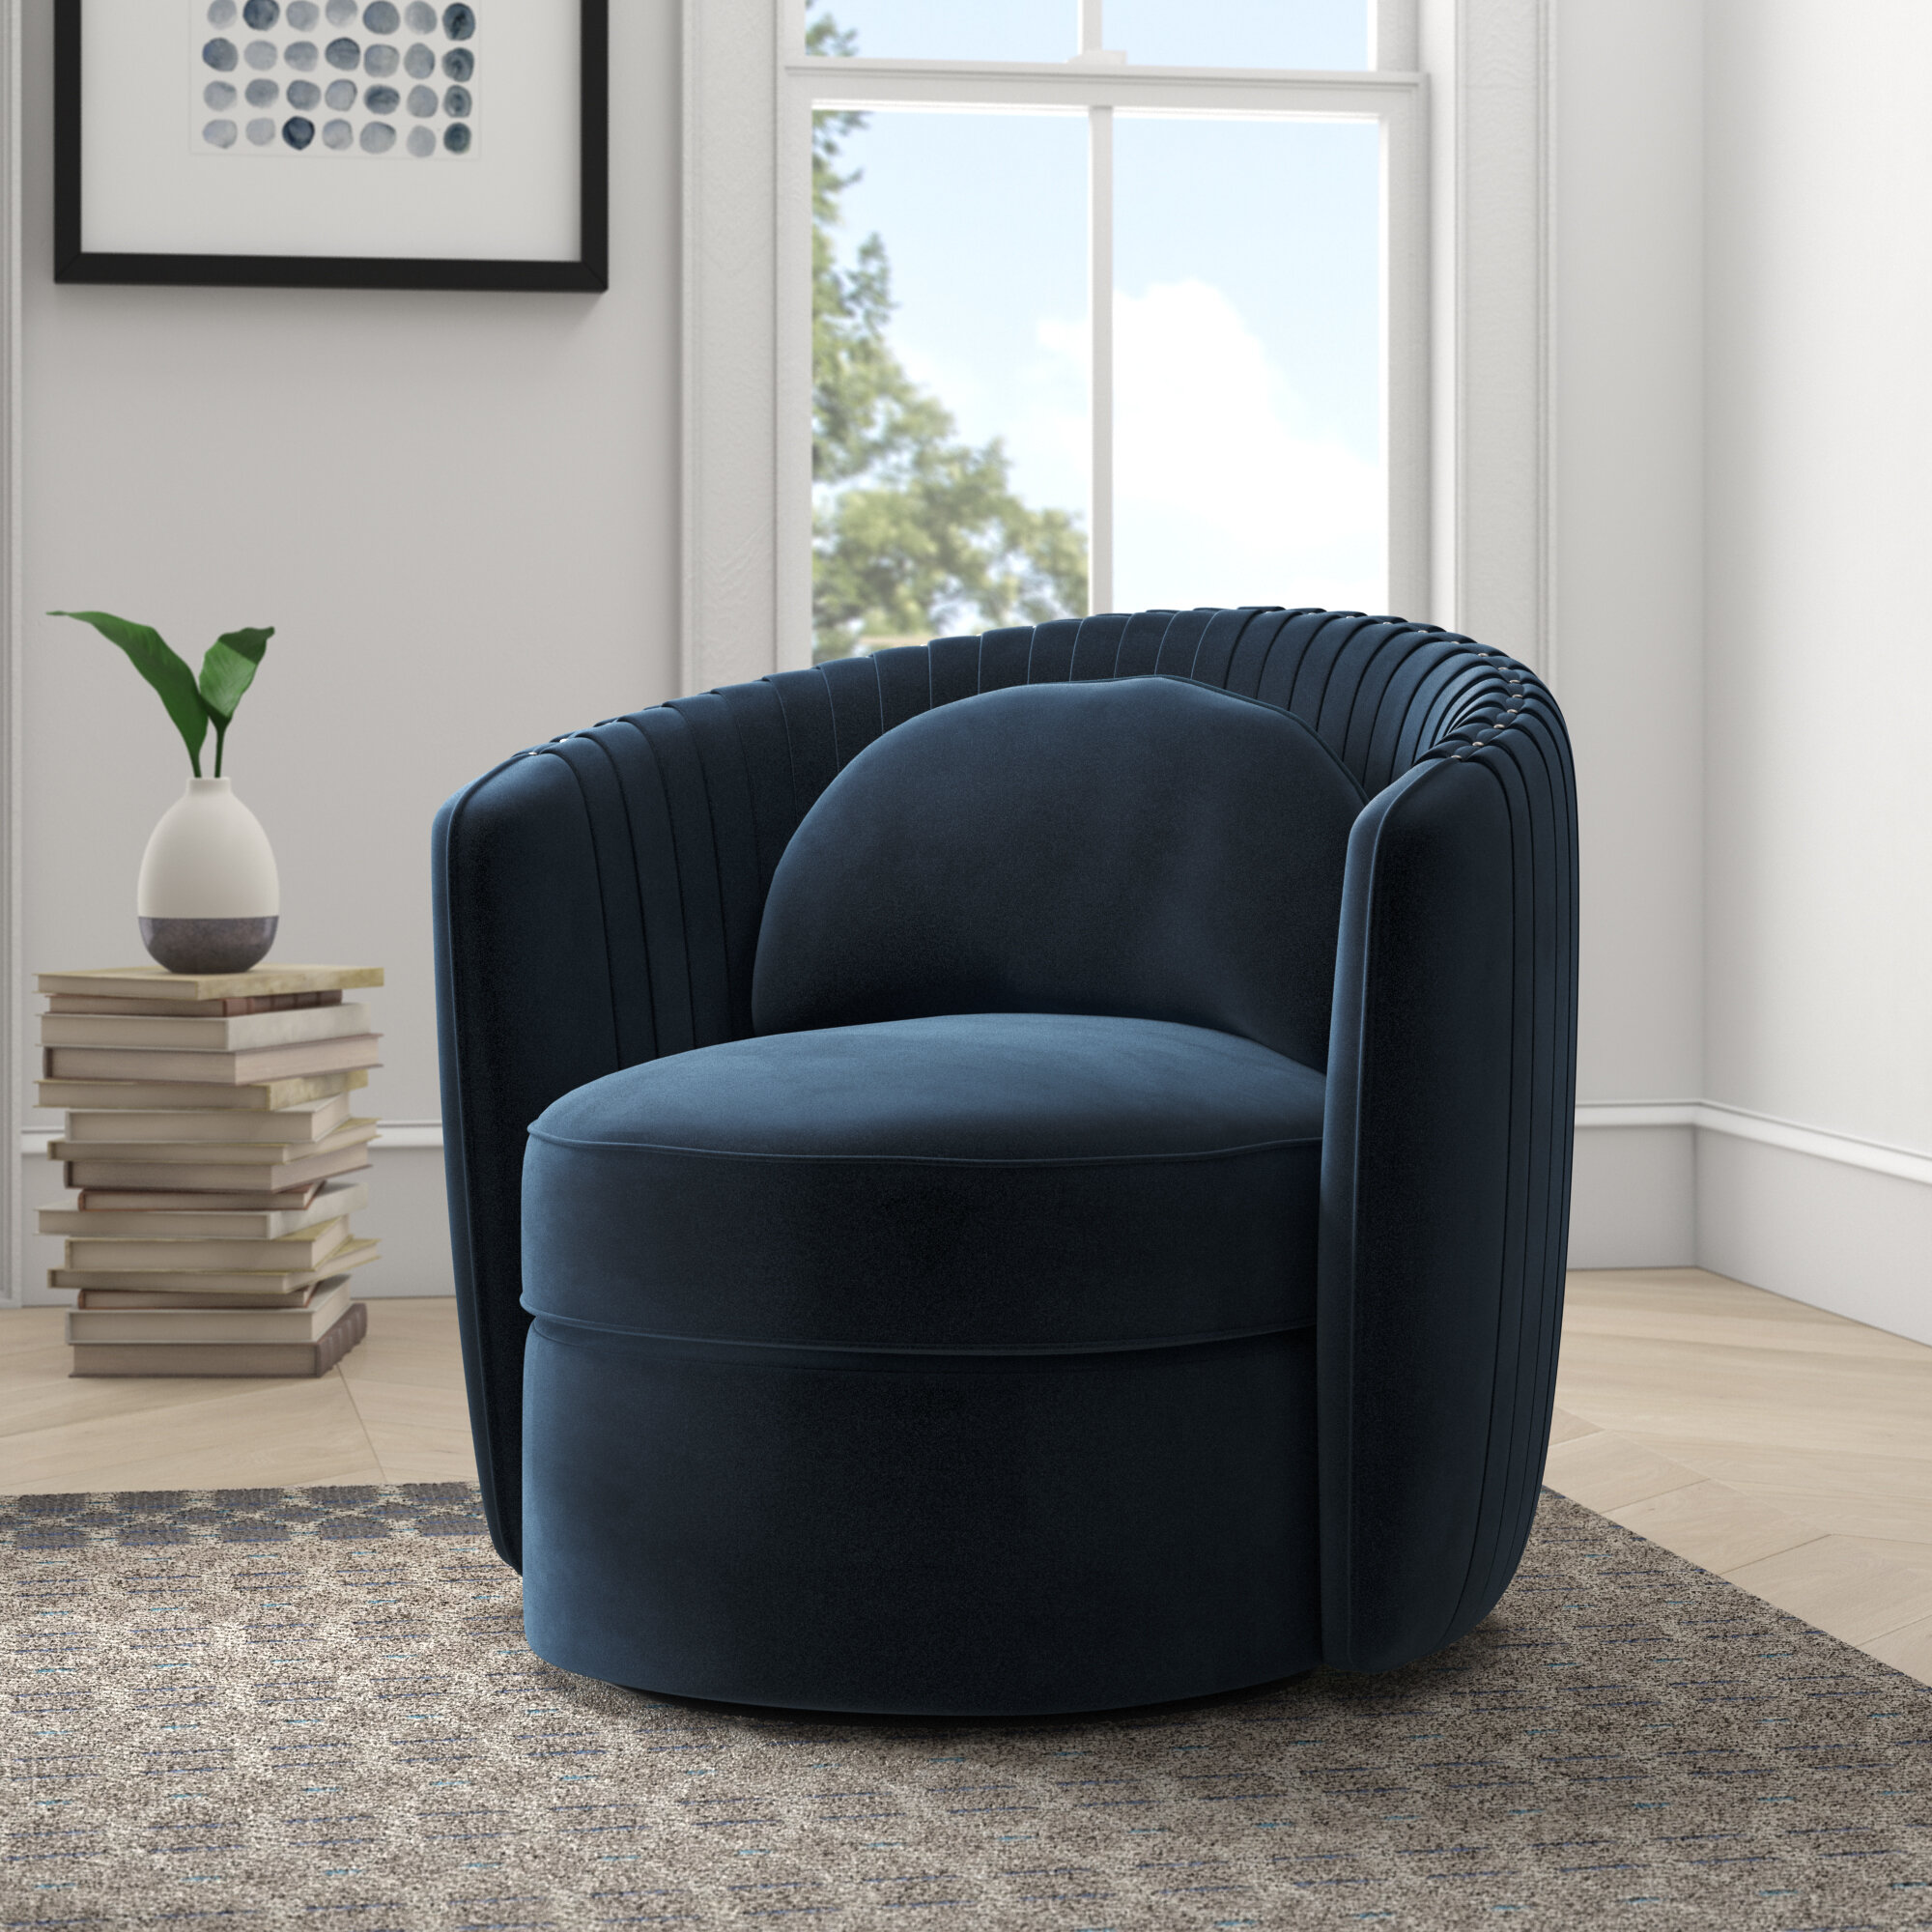 Annalise Swivel 23 62 Barrel Chair Reviews Allmodern